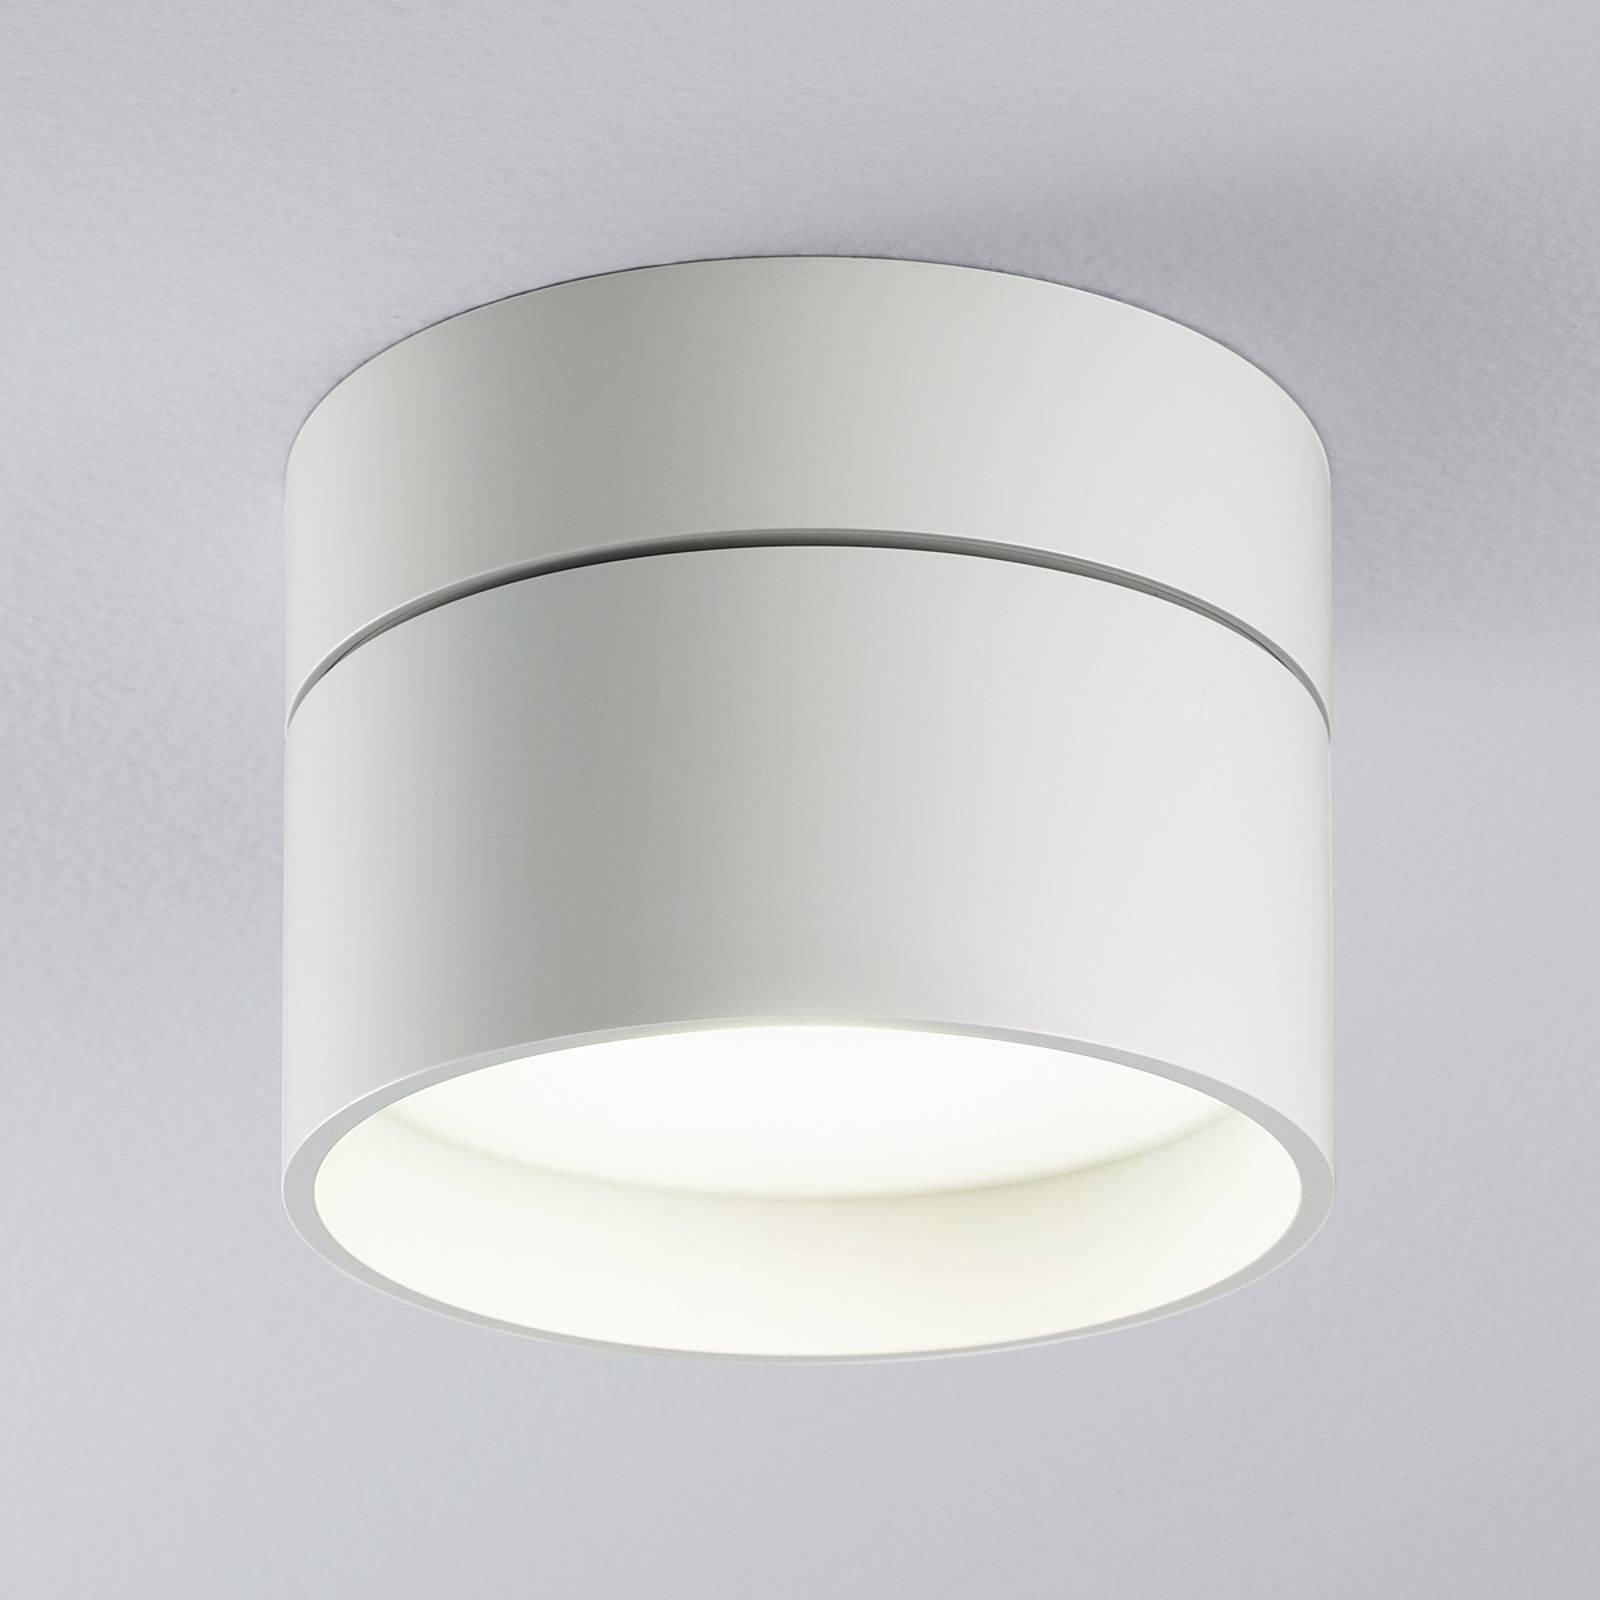 LED-kattovalaisin Piper, 11 cm